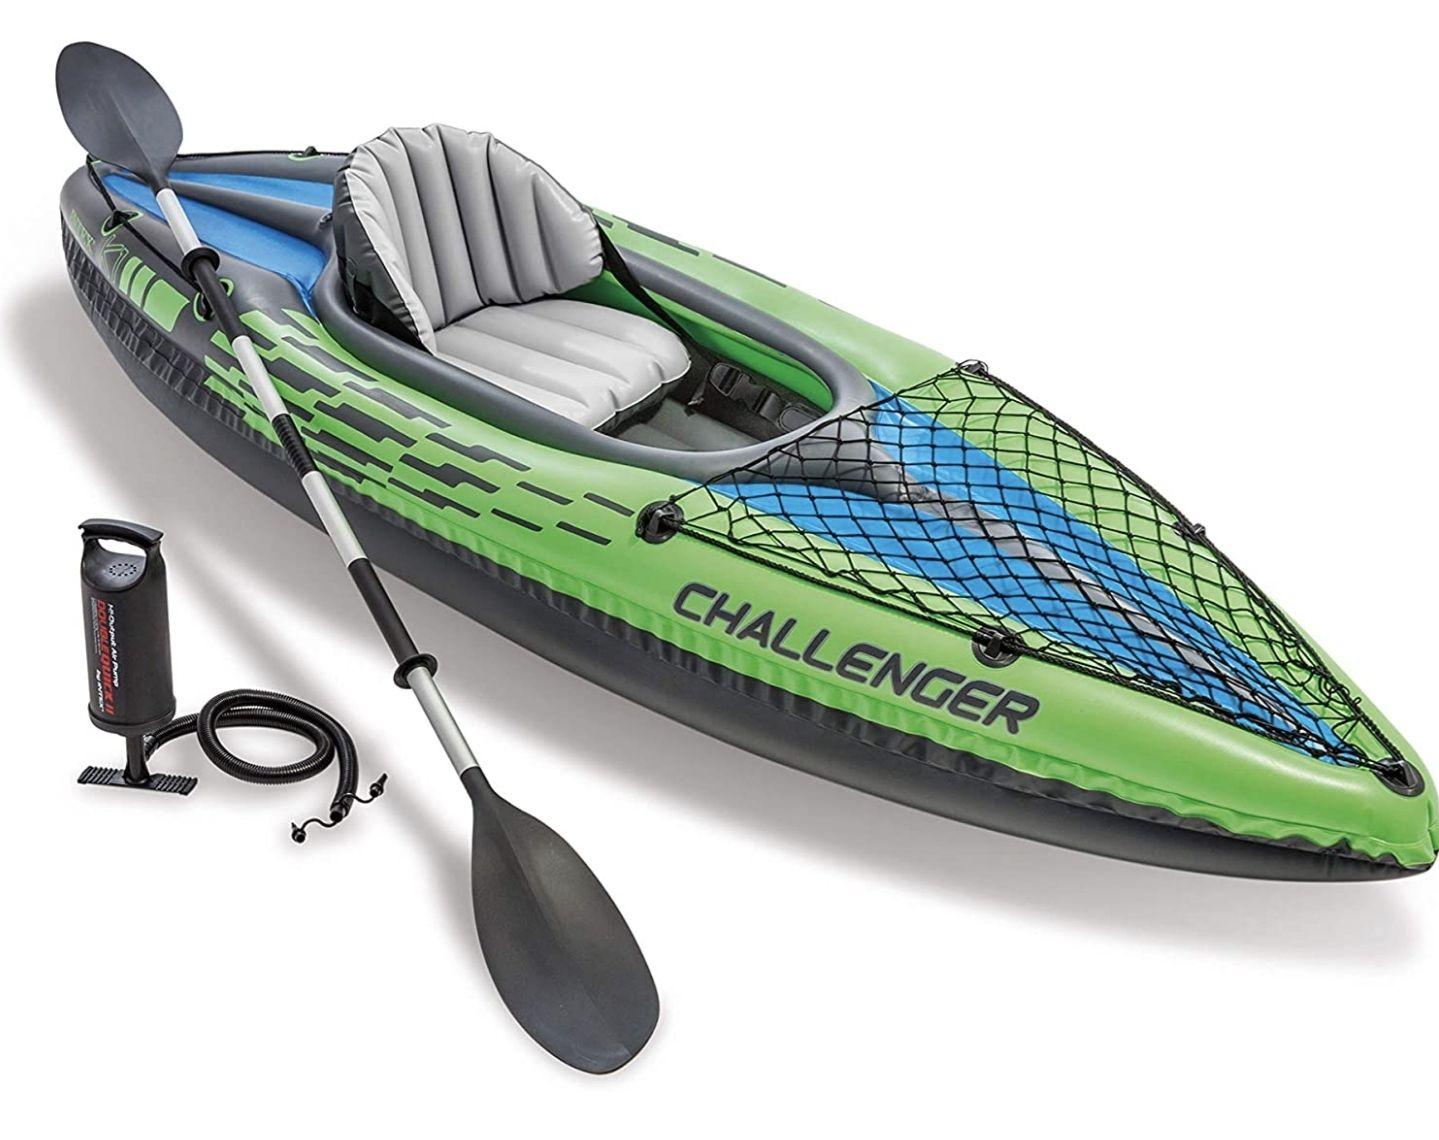 Intex Challenger Kayak, Man Inflatable Canoe with Aluminum Oars and Hand Pump - £92.16 (UK Mainland) Sold By Amazon EU @ Amazon